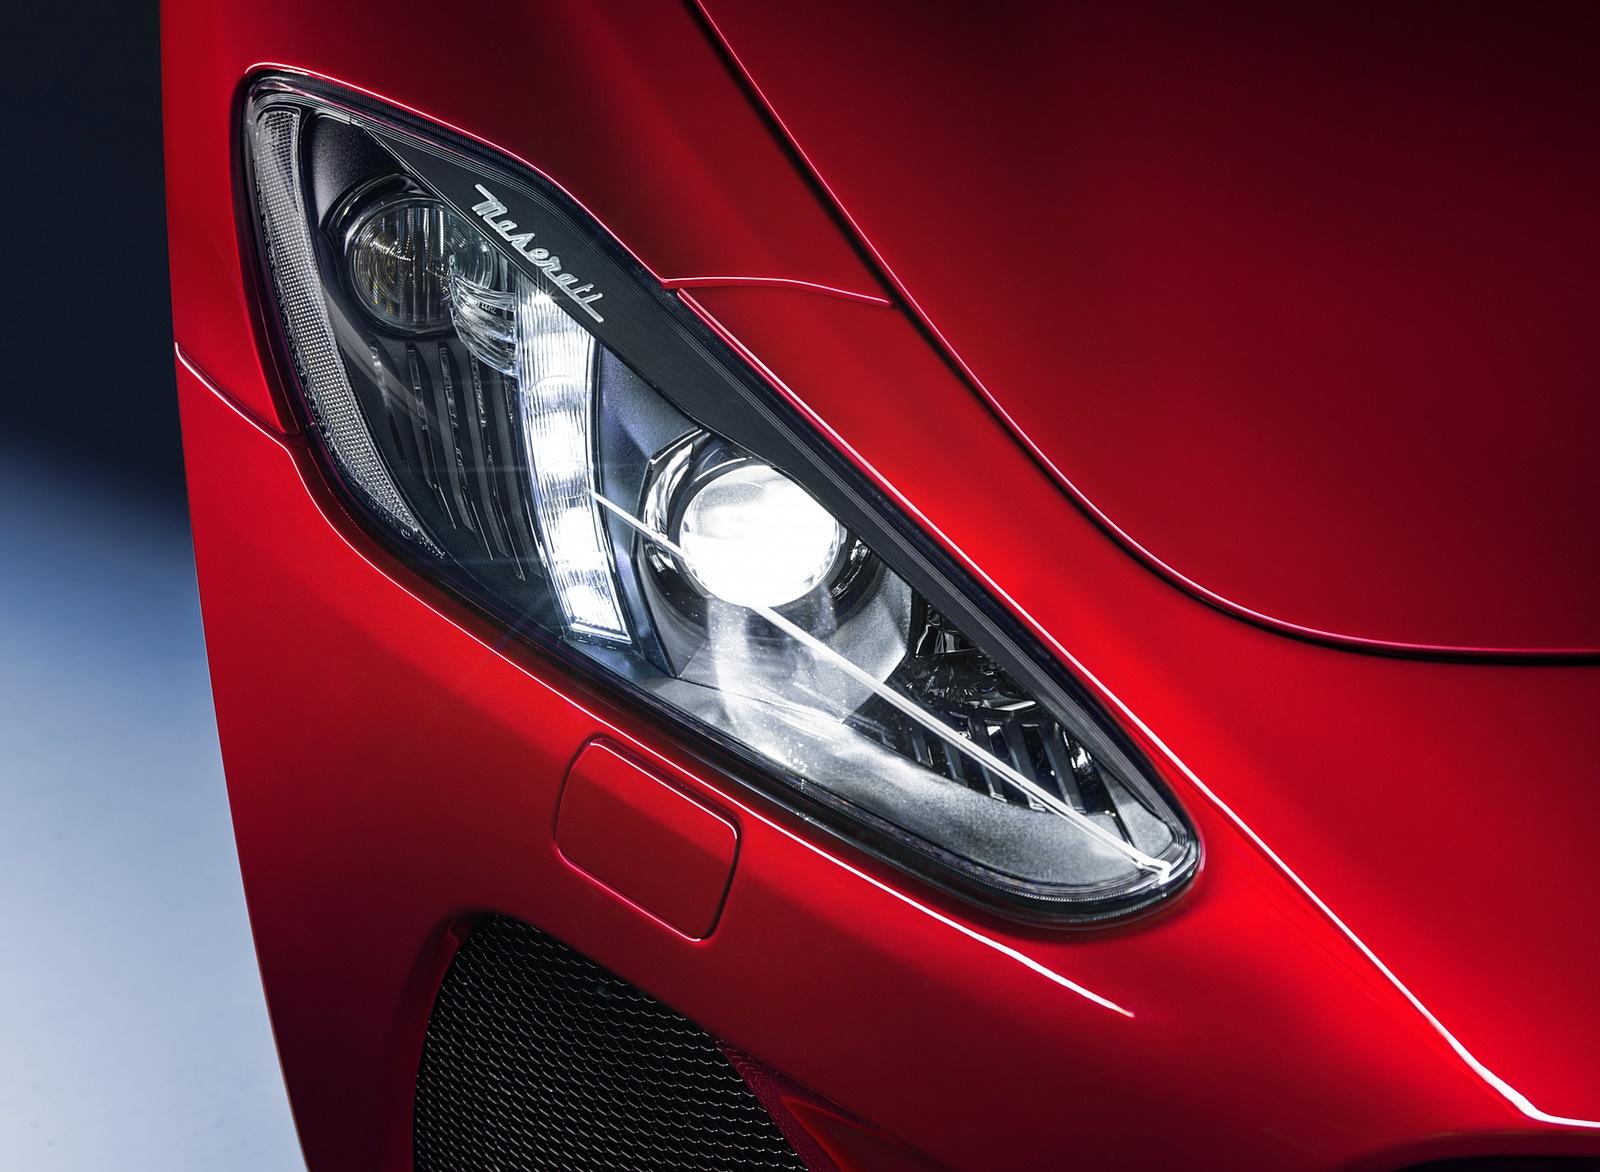 2018 Maserati GranTurismo MC Sport Line Headlight Wallpapers (10)